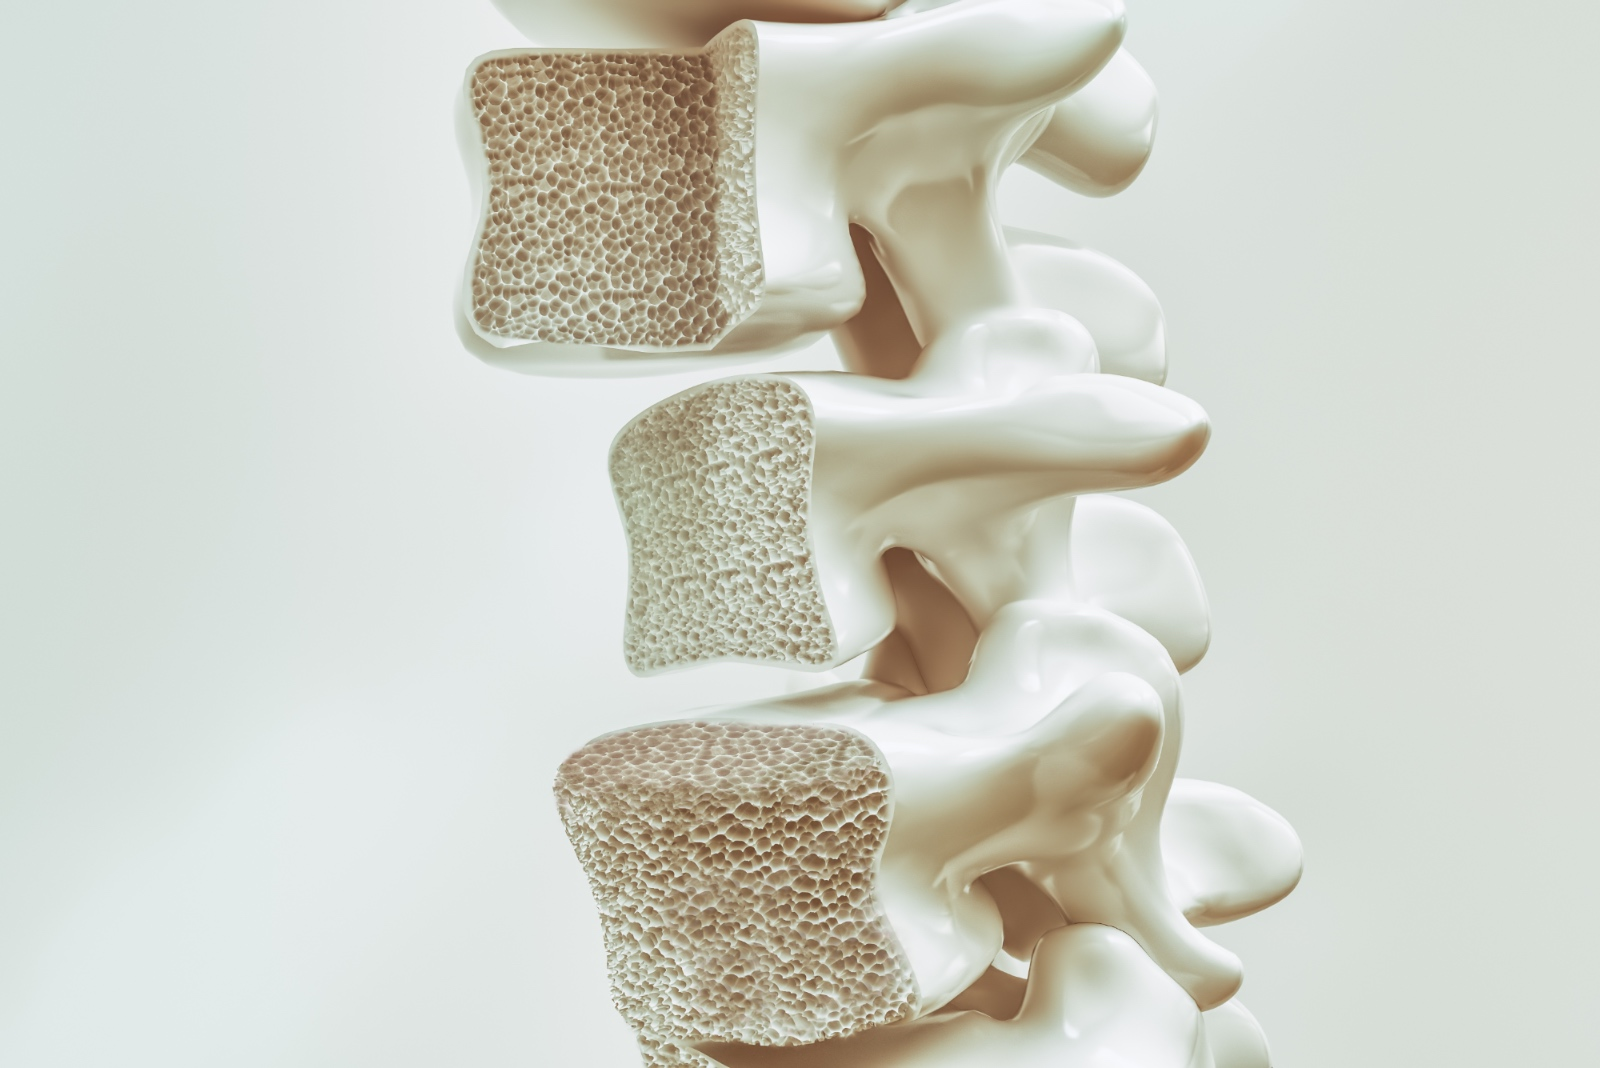 Biomimetic Porosity Can Be A Determinant Of Bone Graft Success.